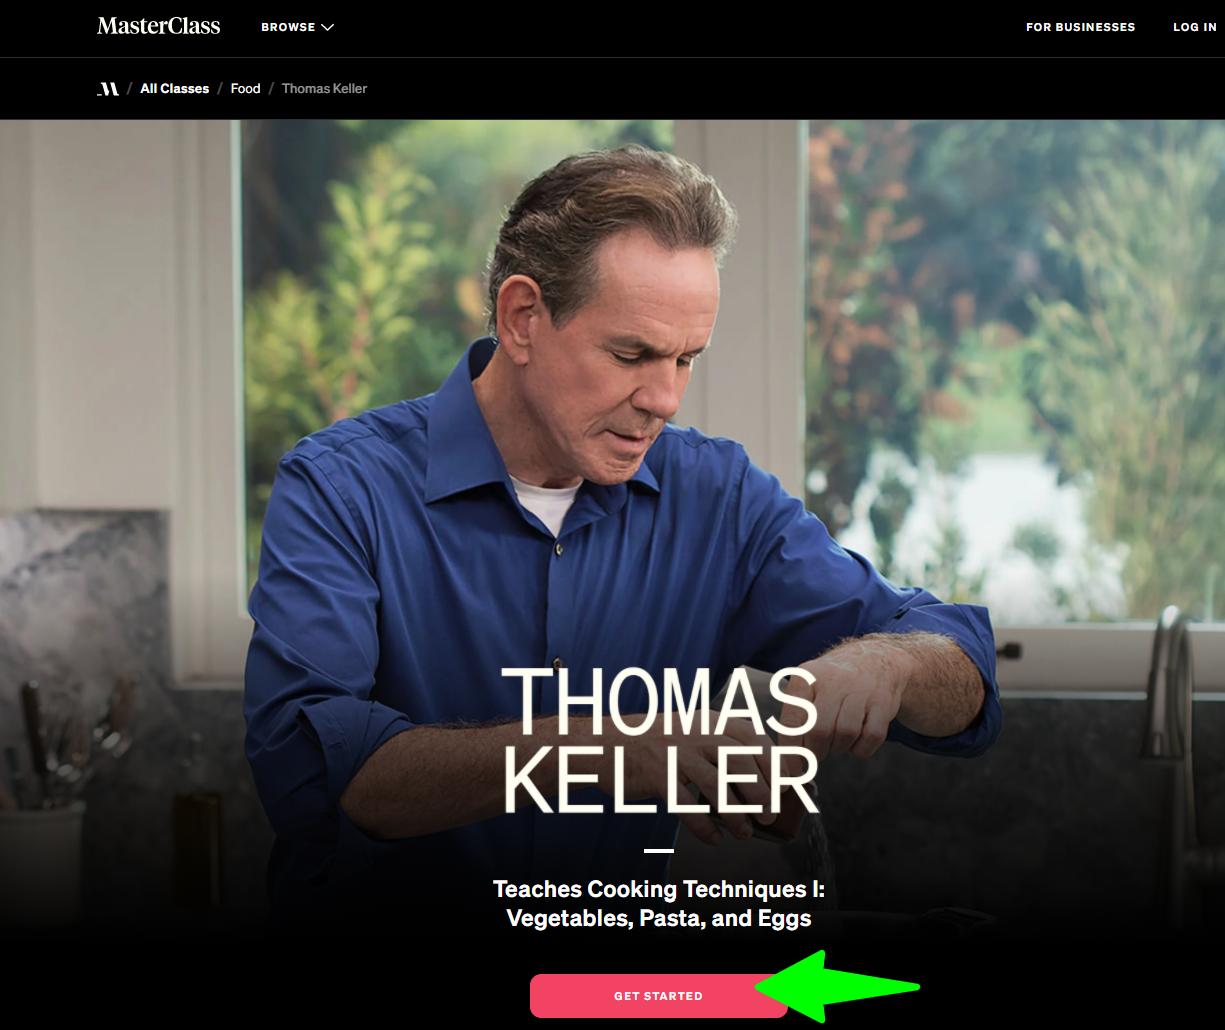 Thomas-Keller-Teaches-Cooking-Techniques-MasterClass